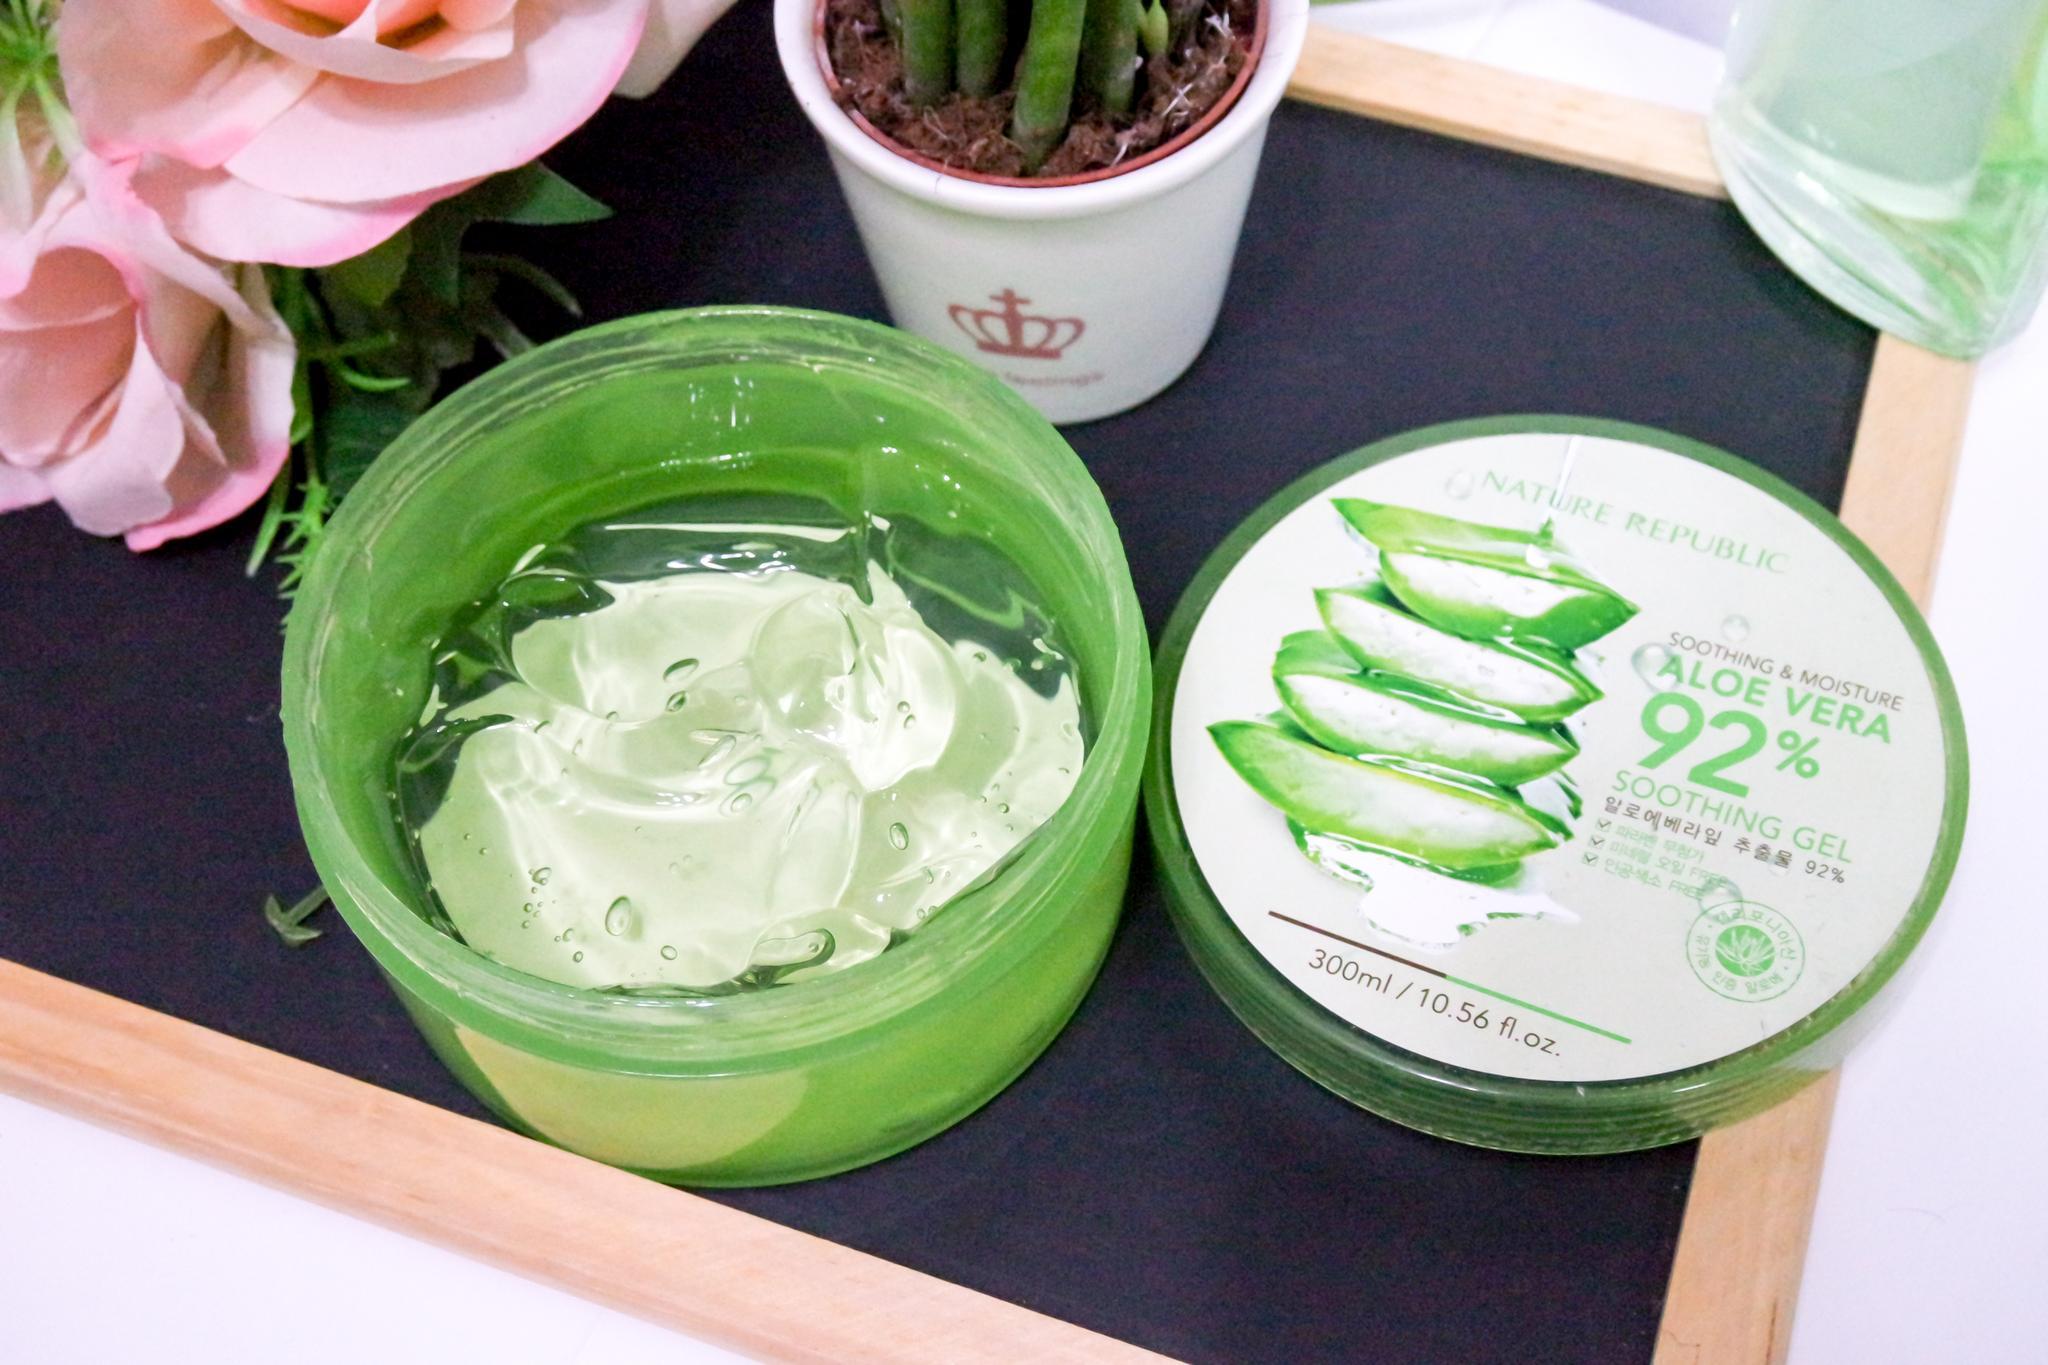 Ini 8 Cara Unik Penggunaan Nature Republic Aloe Vera Lainnya Selain Jadi Pelembap Wajah Body&Skincare